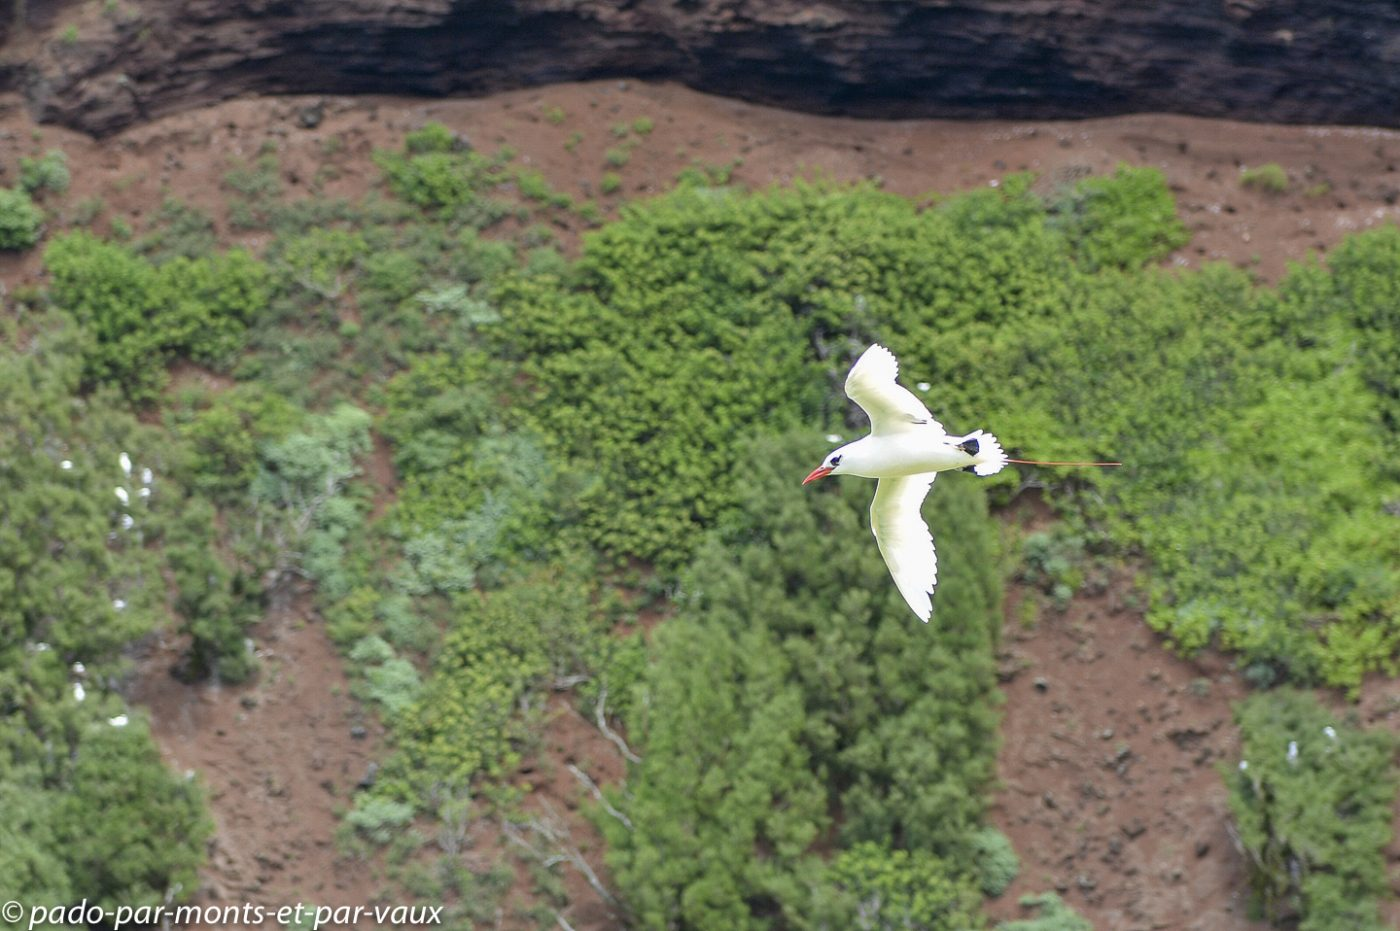 Kauai  - Kilauea point - Phaéton à brins rouges